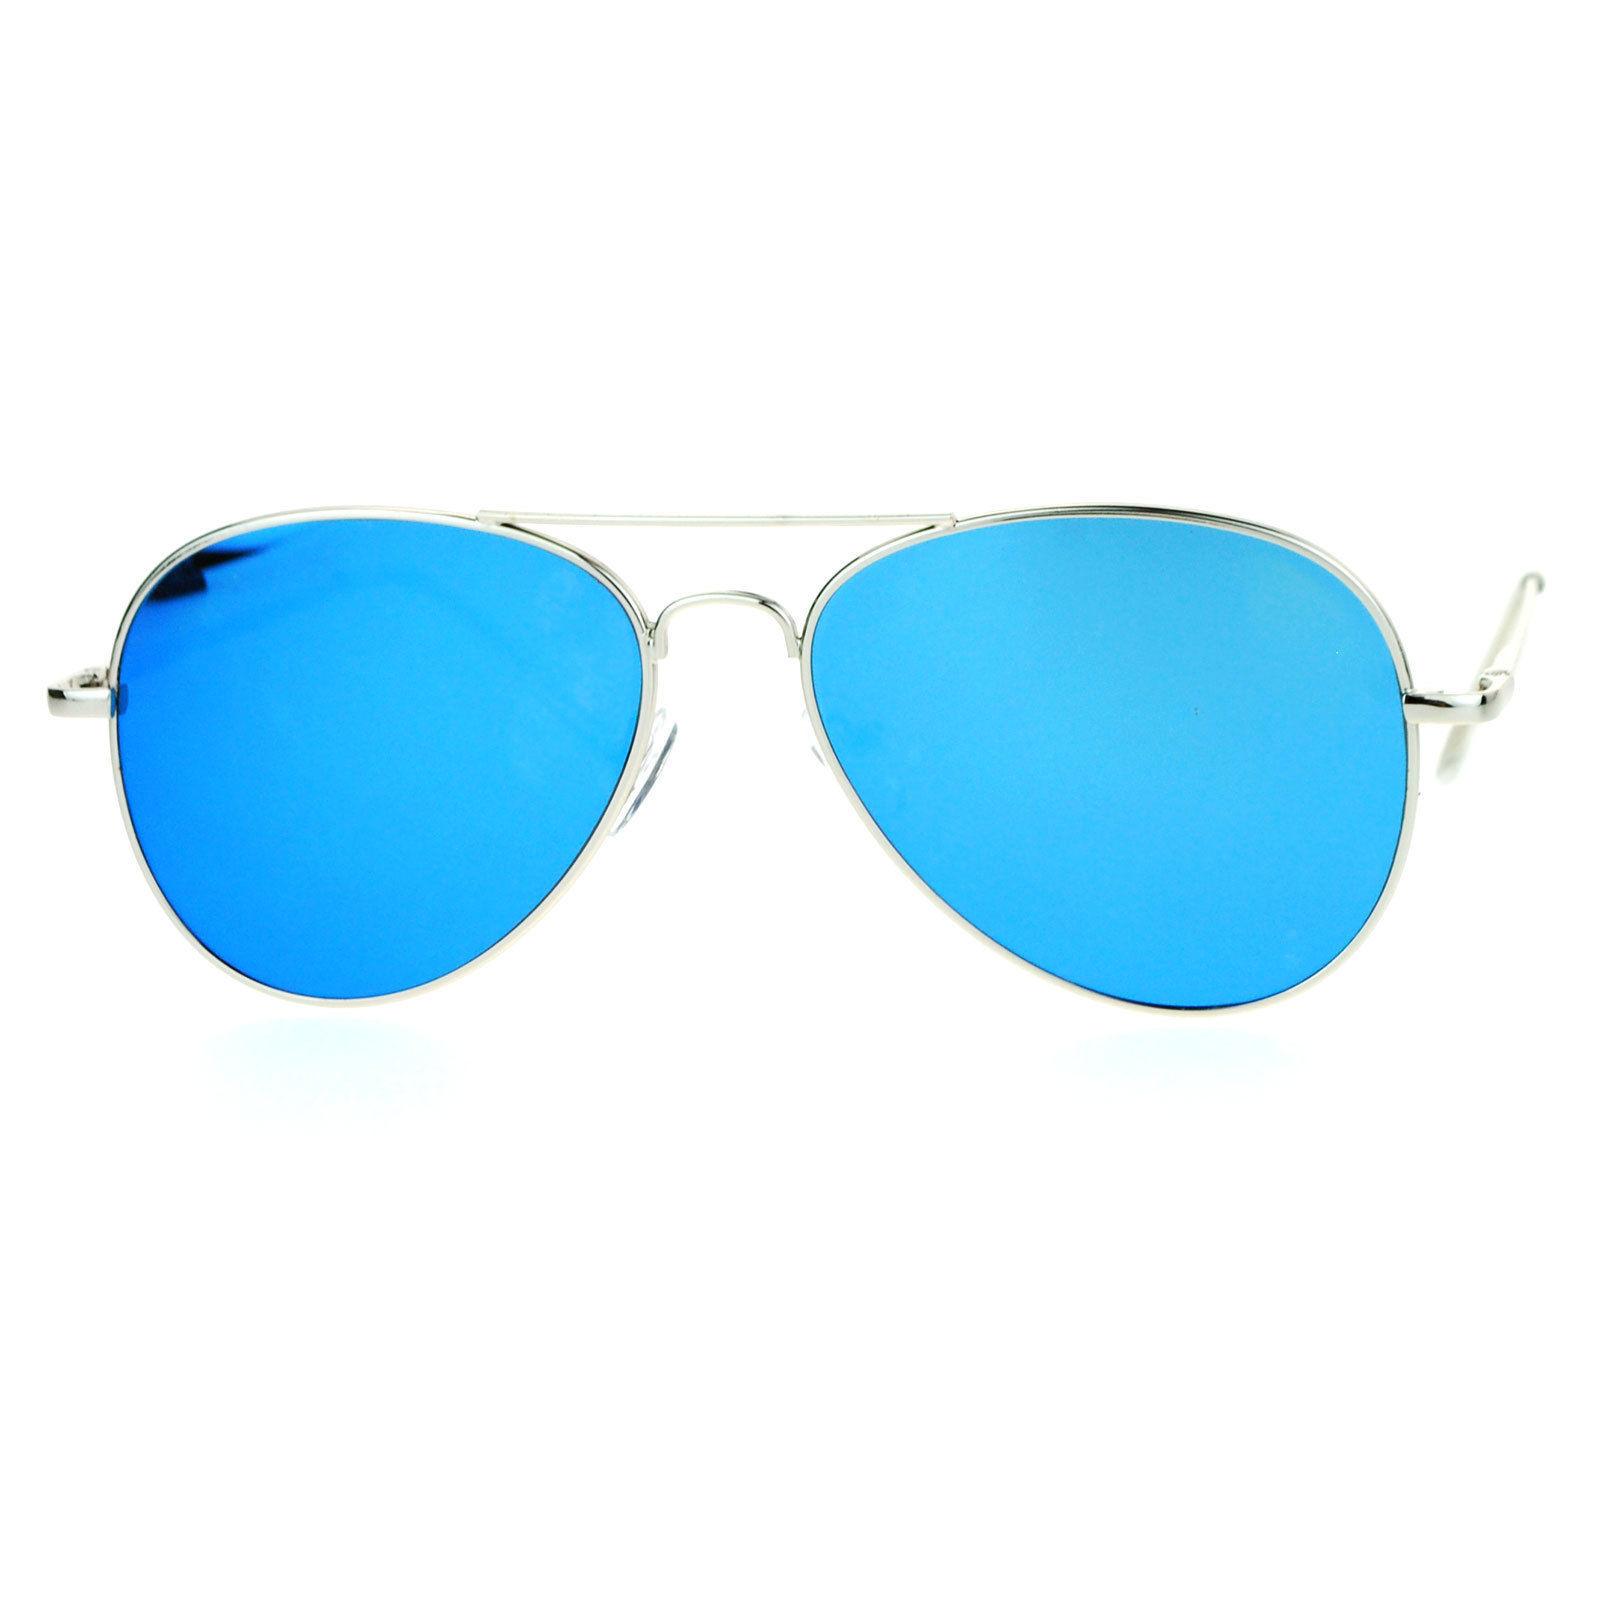 Flat Lens Aviator Sunglasses Thin Metal Spring Hinge Frame Silver Mirror Lens